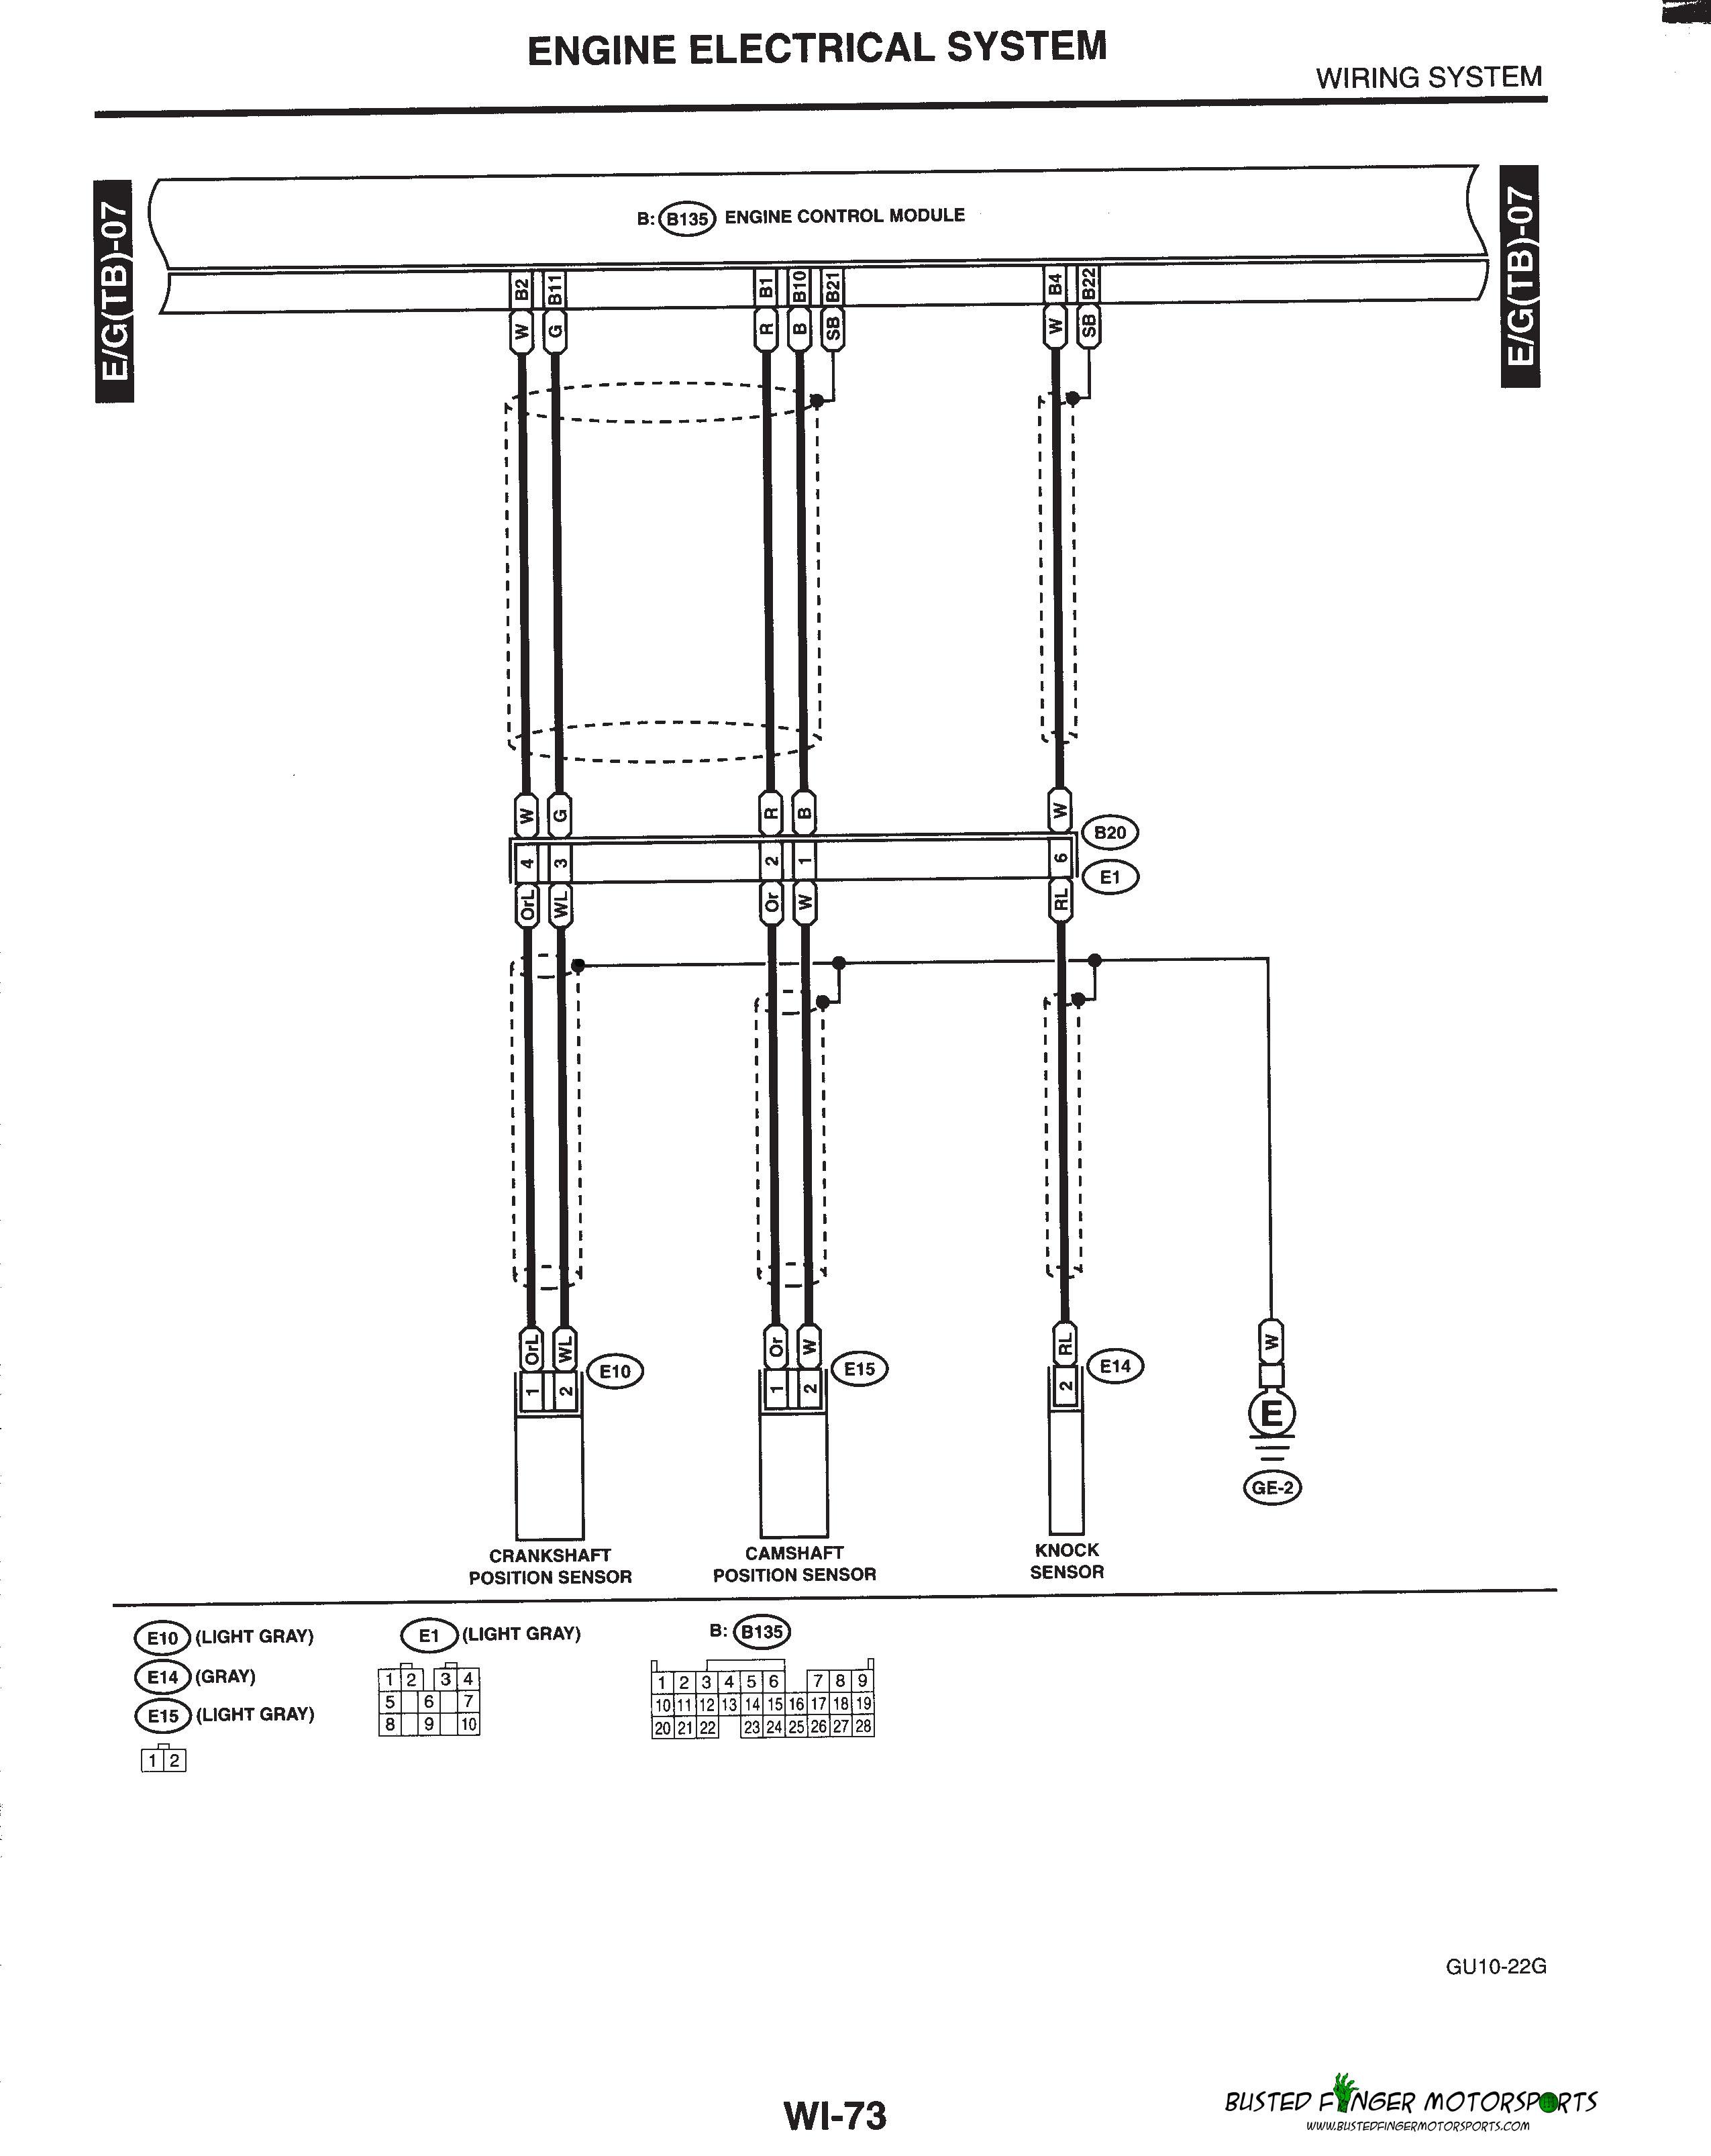 obd2a to obd2b distributor wiring diagram baja 50cc atv integra imageresizertool com